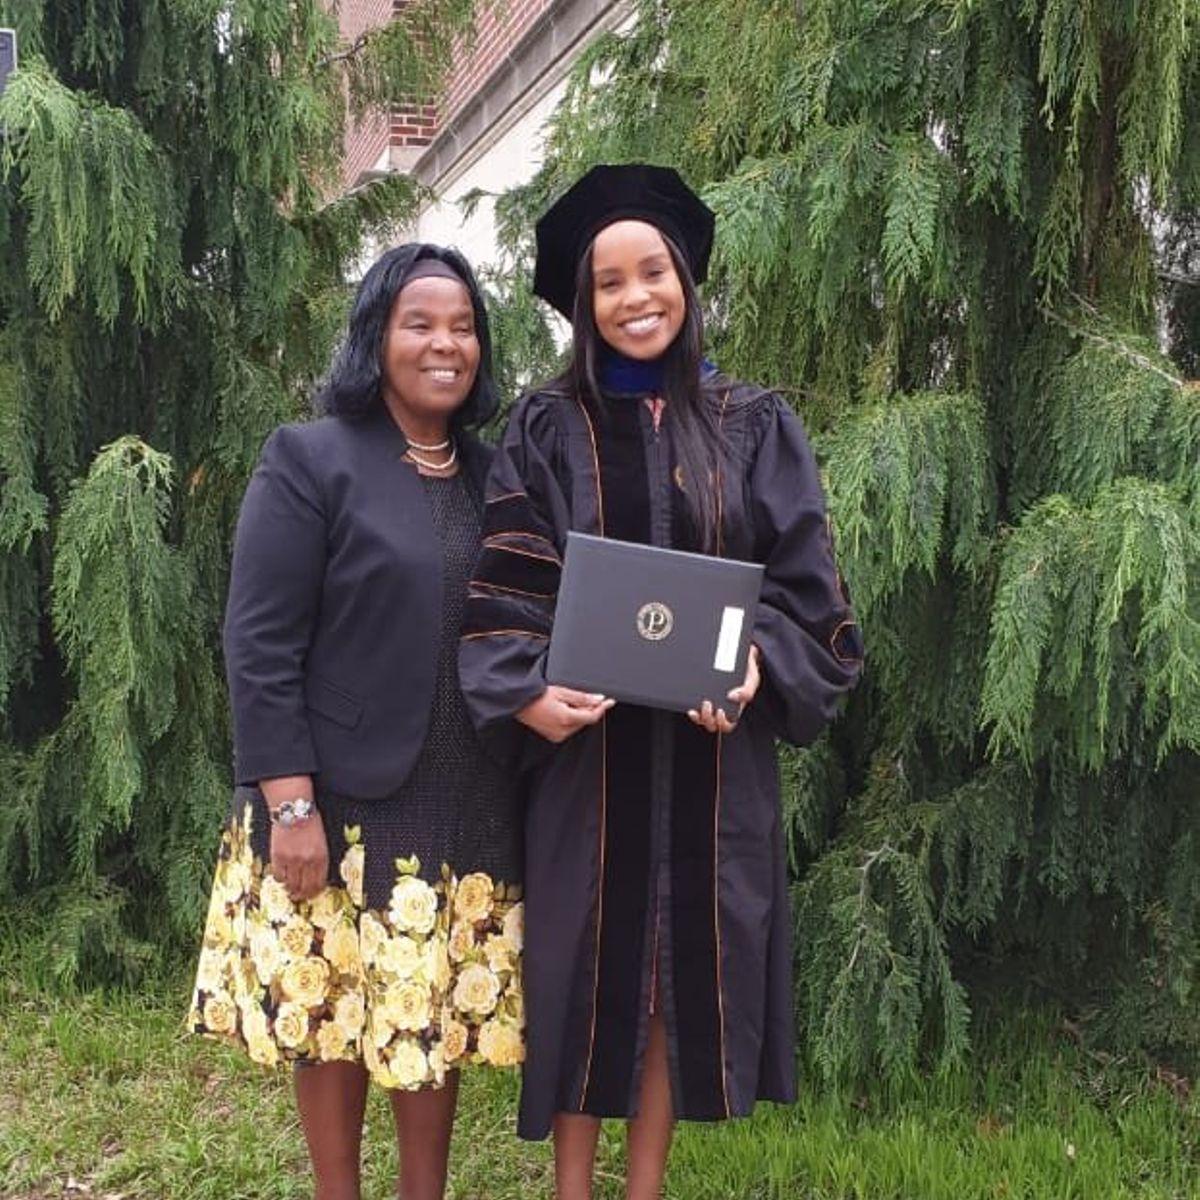 Prof Olive Mugenda's daughter awarded PhD in engineering